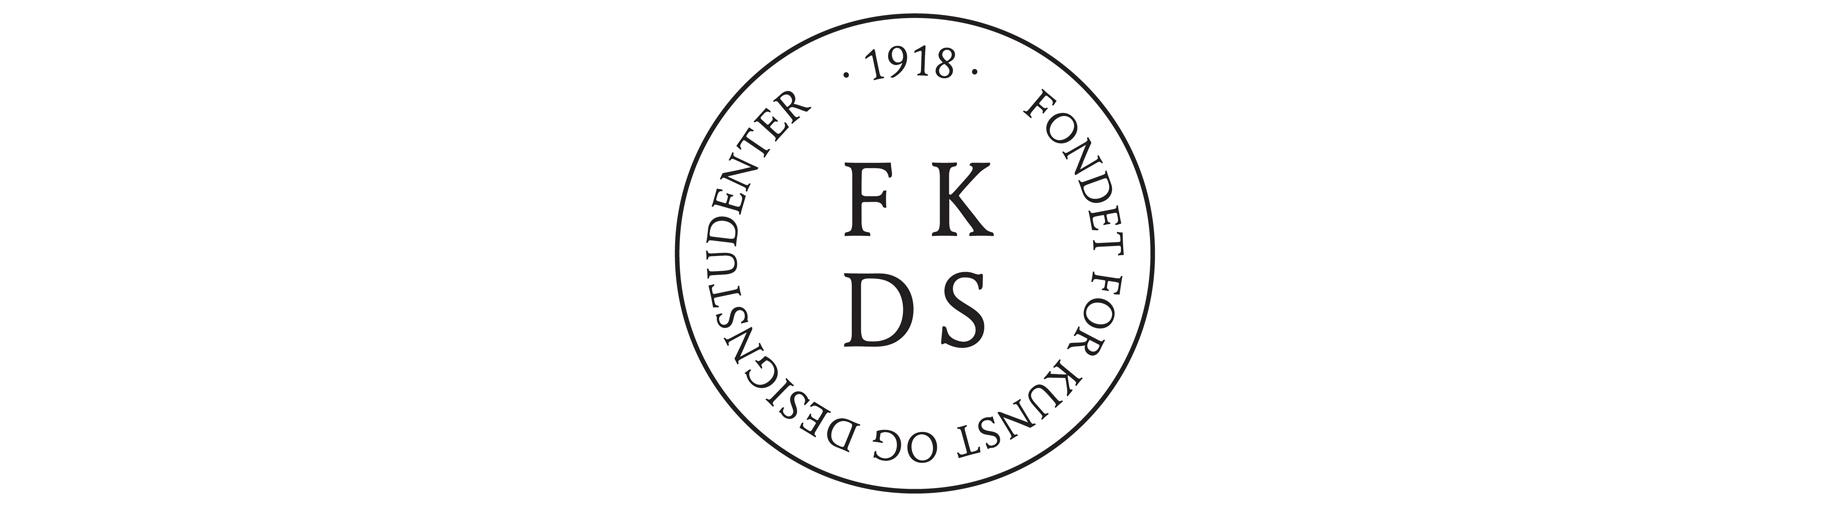 Fondet for Kunst- og Designstudenter